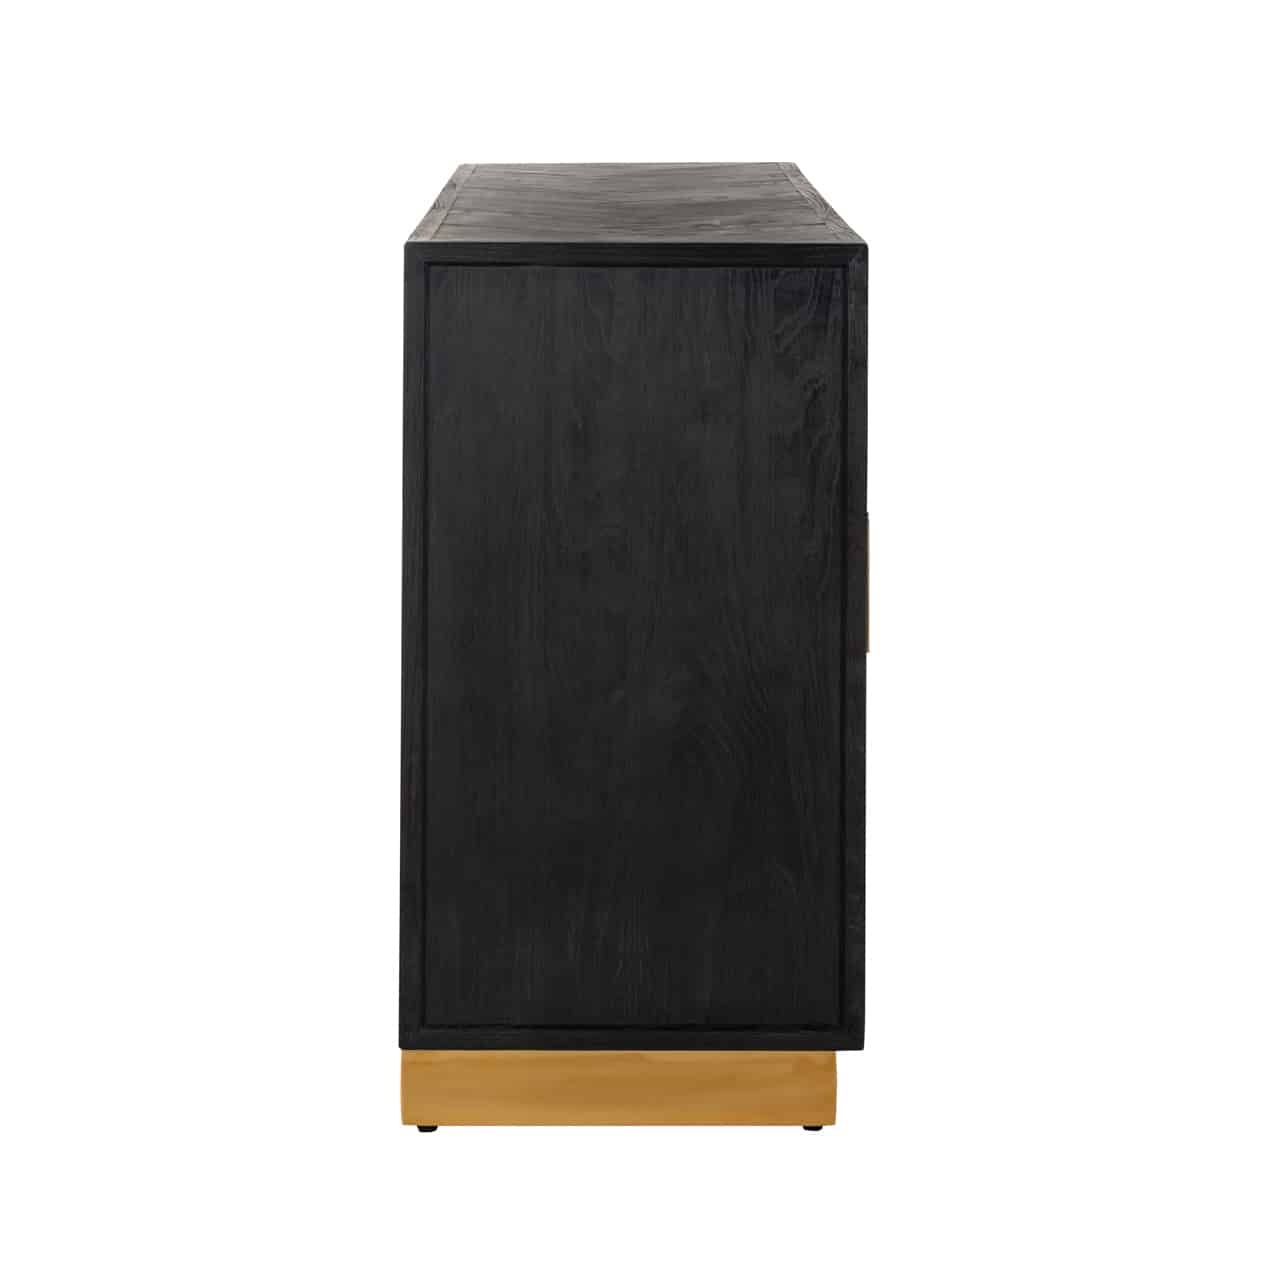 Dressoir Blackbone gold 4-deuren (Black)